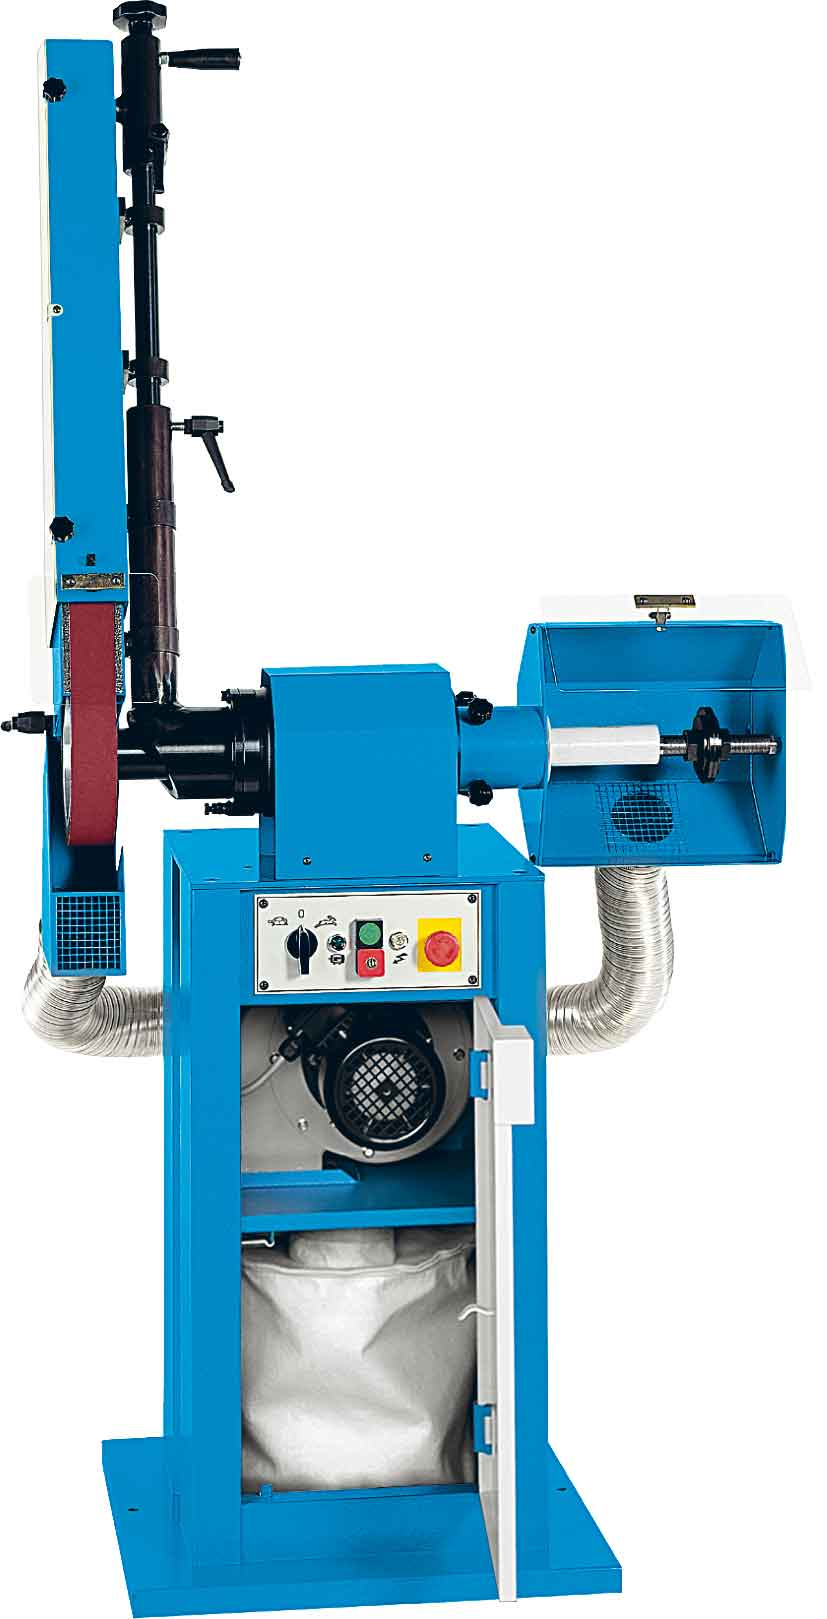 ART.32 - Belt grinding machine